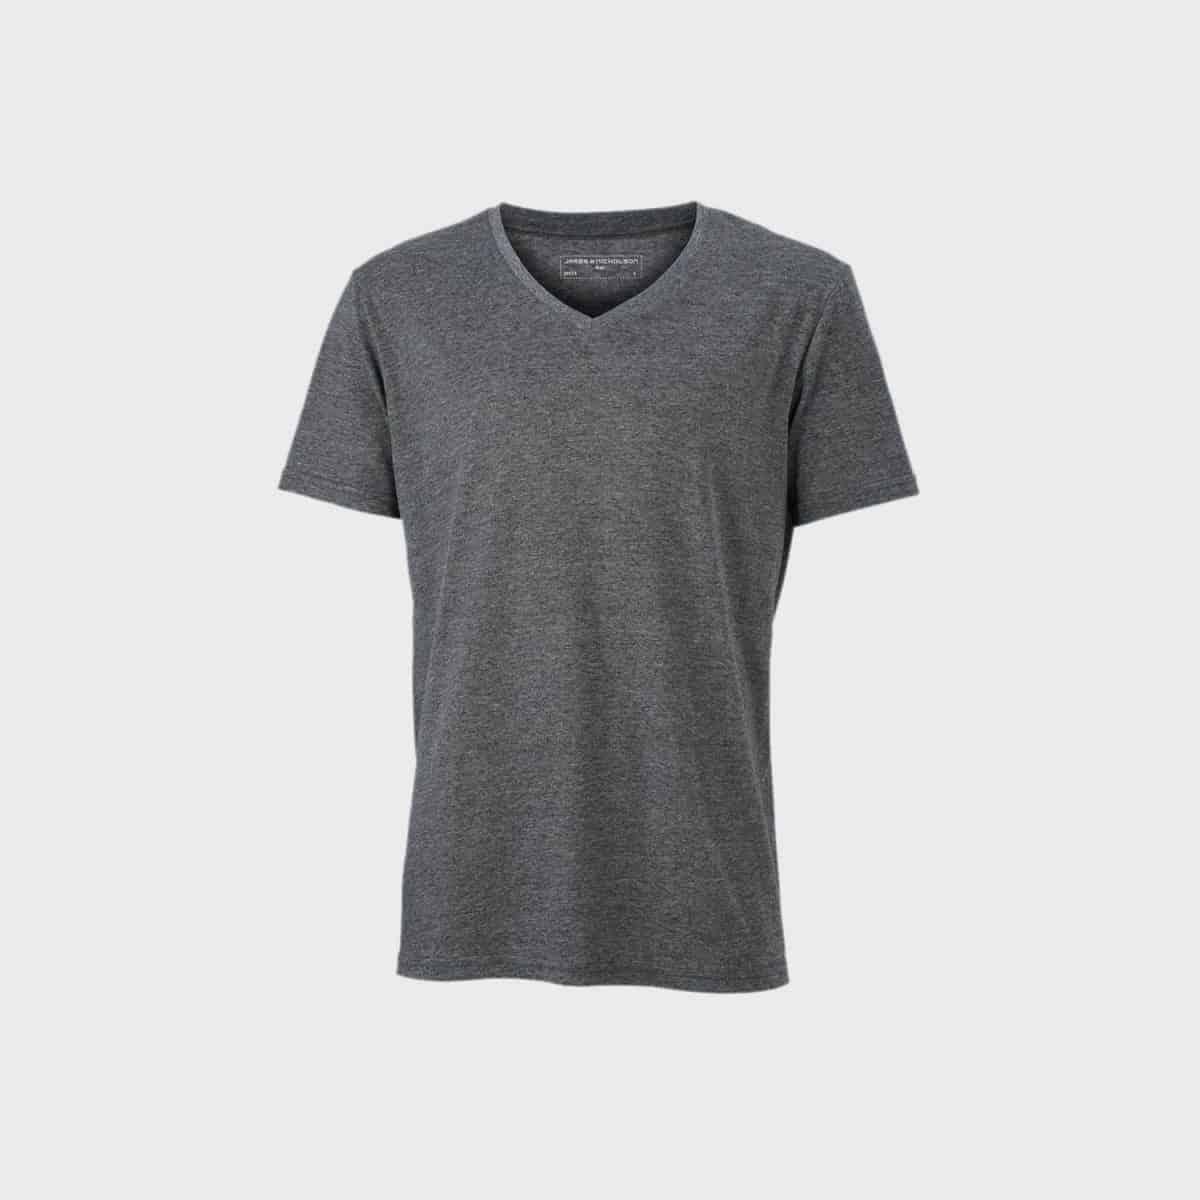 Daiber T Shirts JN974 Blackmelange Front